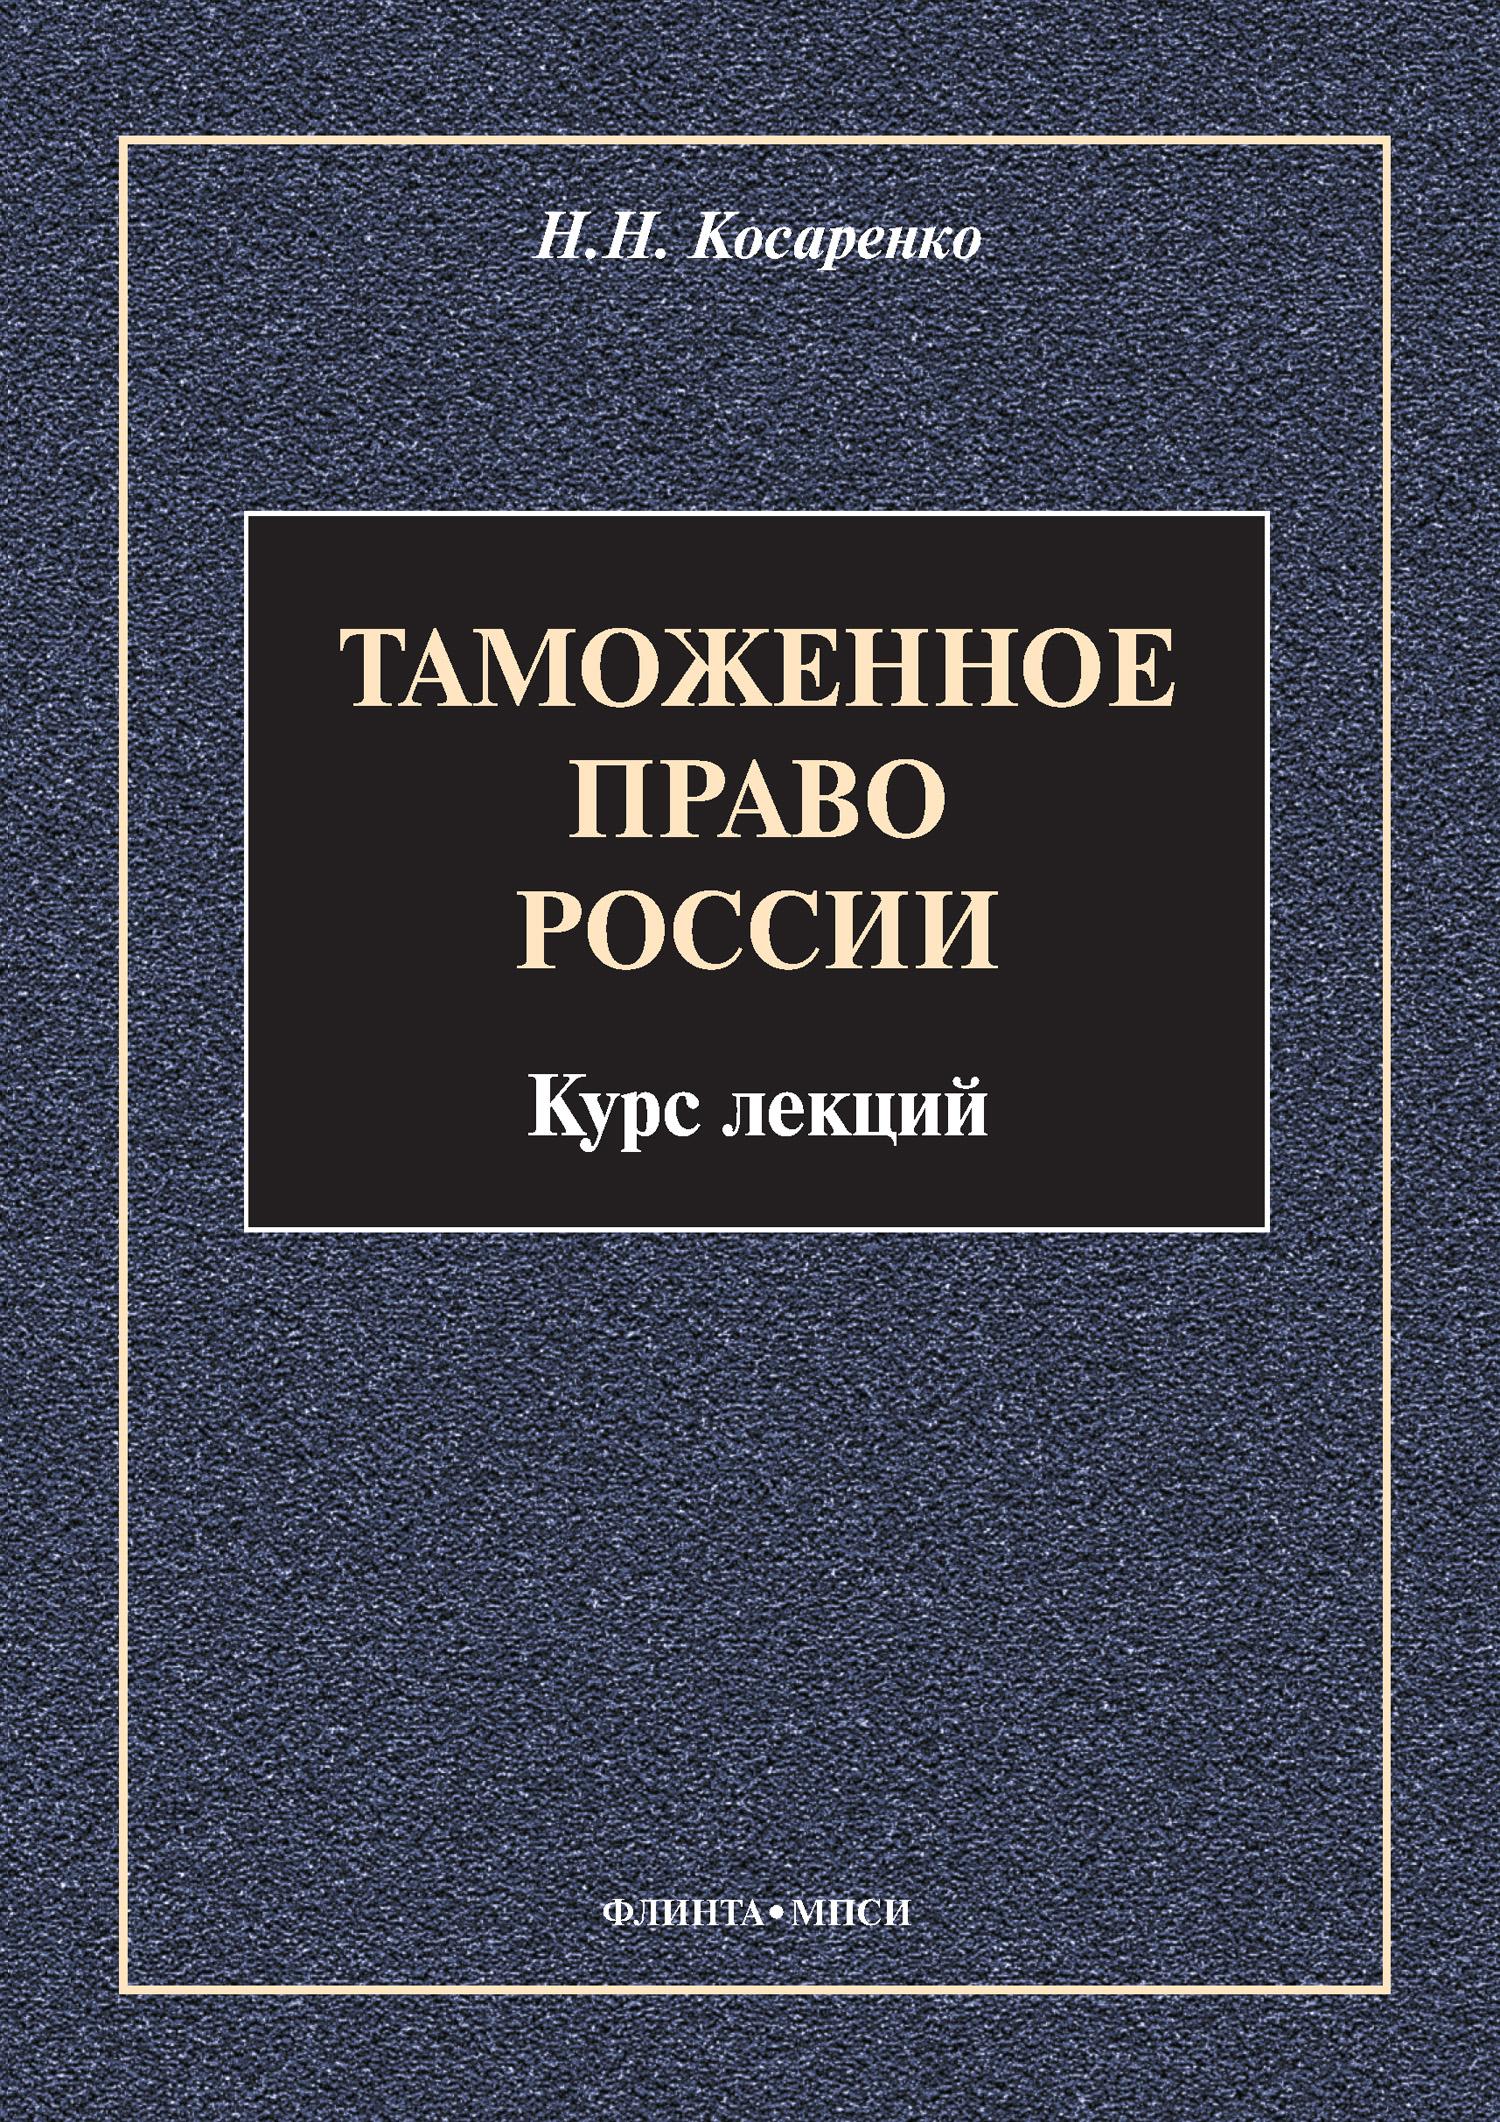 Н. Н. Косаренко Таможенное право России. Курс лекций цена